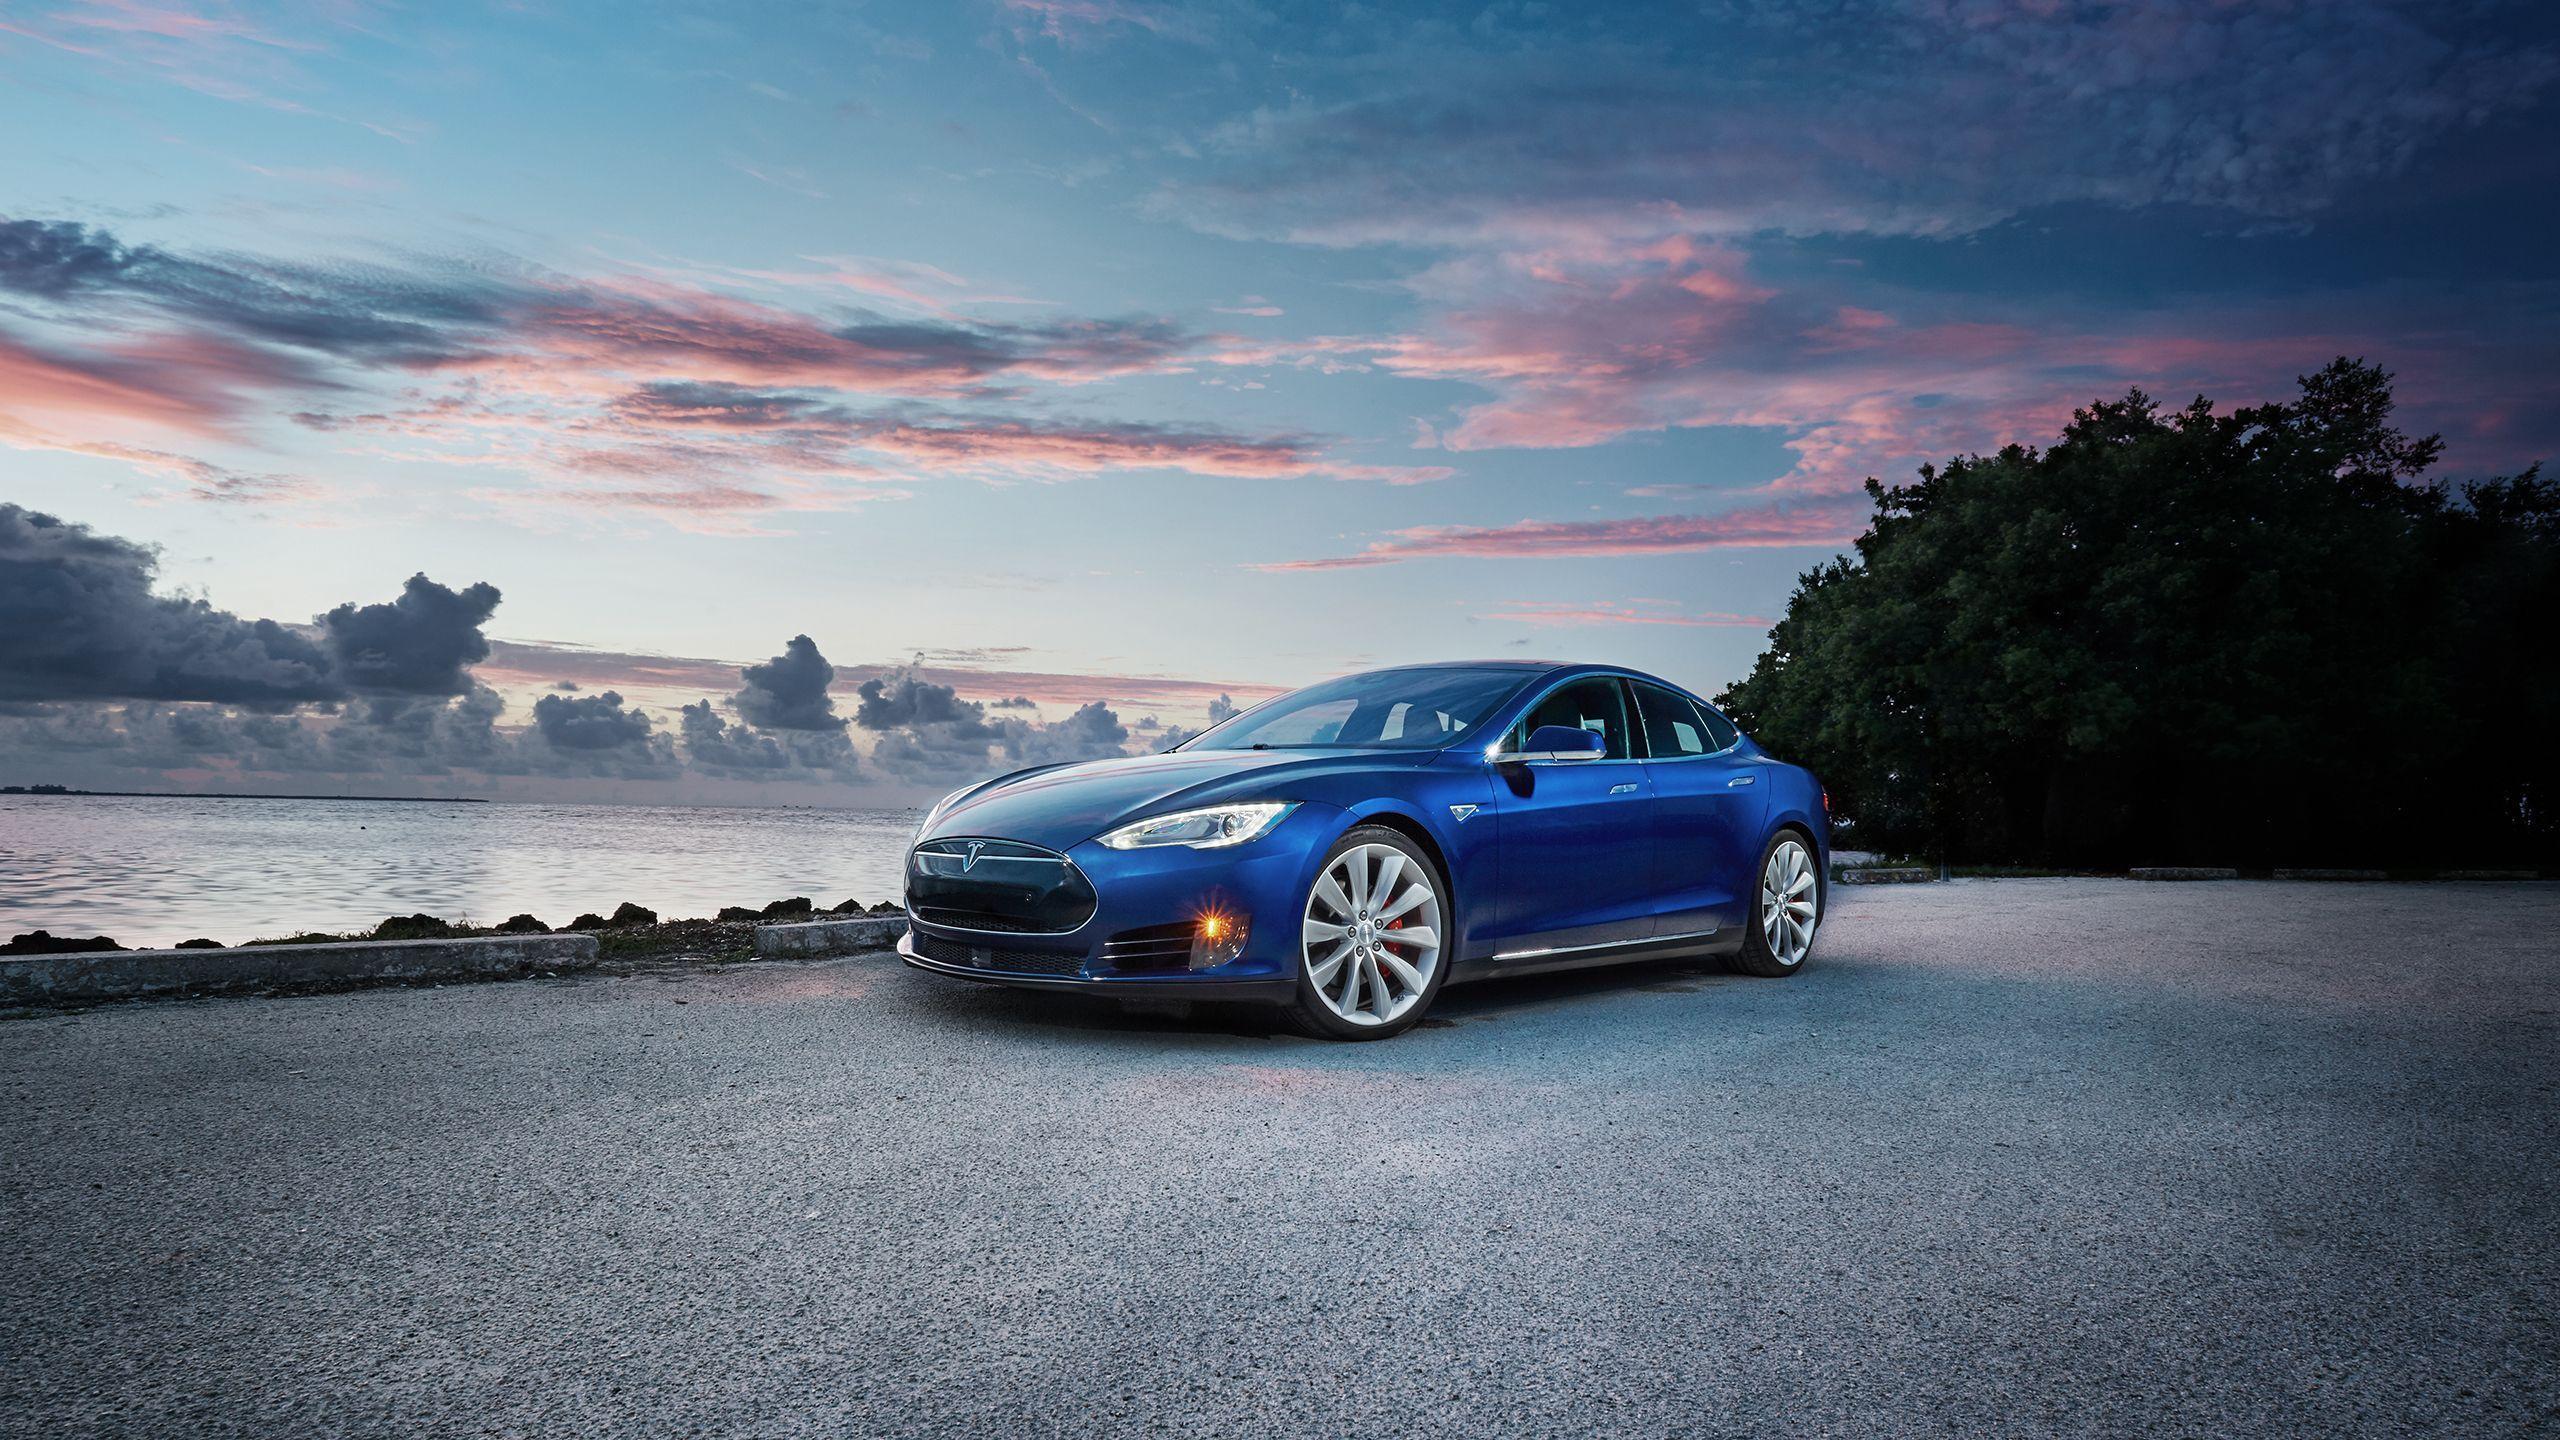 Blue Tesla Model X Wallpapers Top Free Blue Tesla Model X Backgrounds Wallpaperaccess